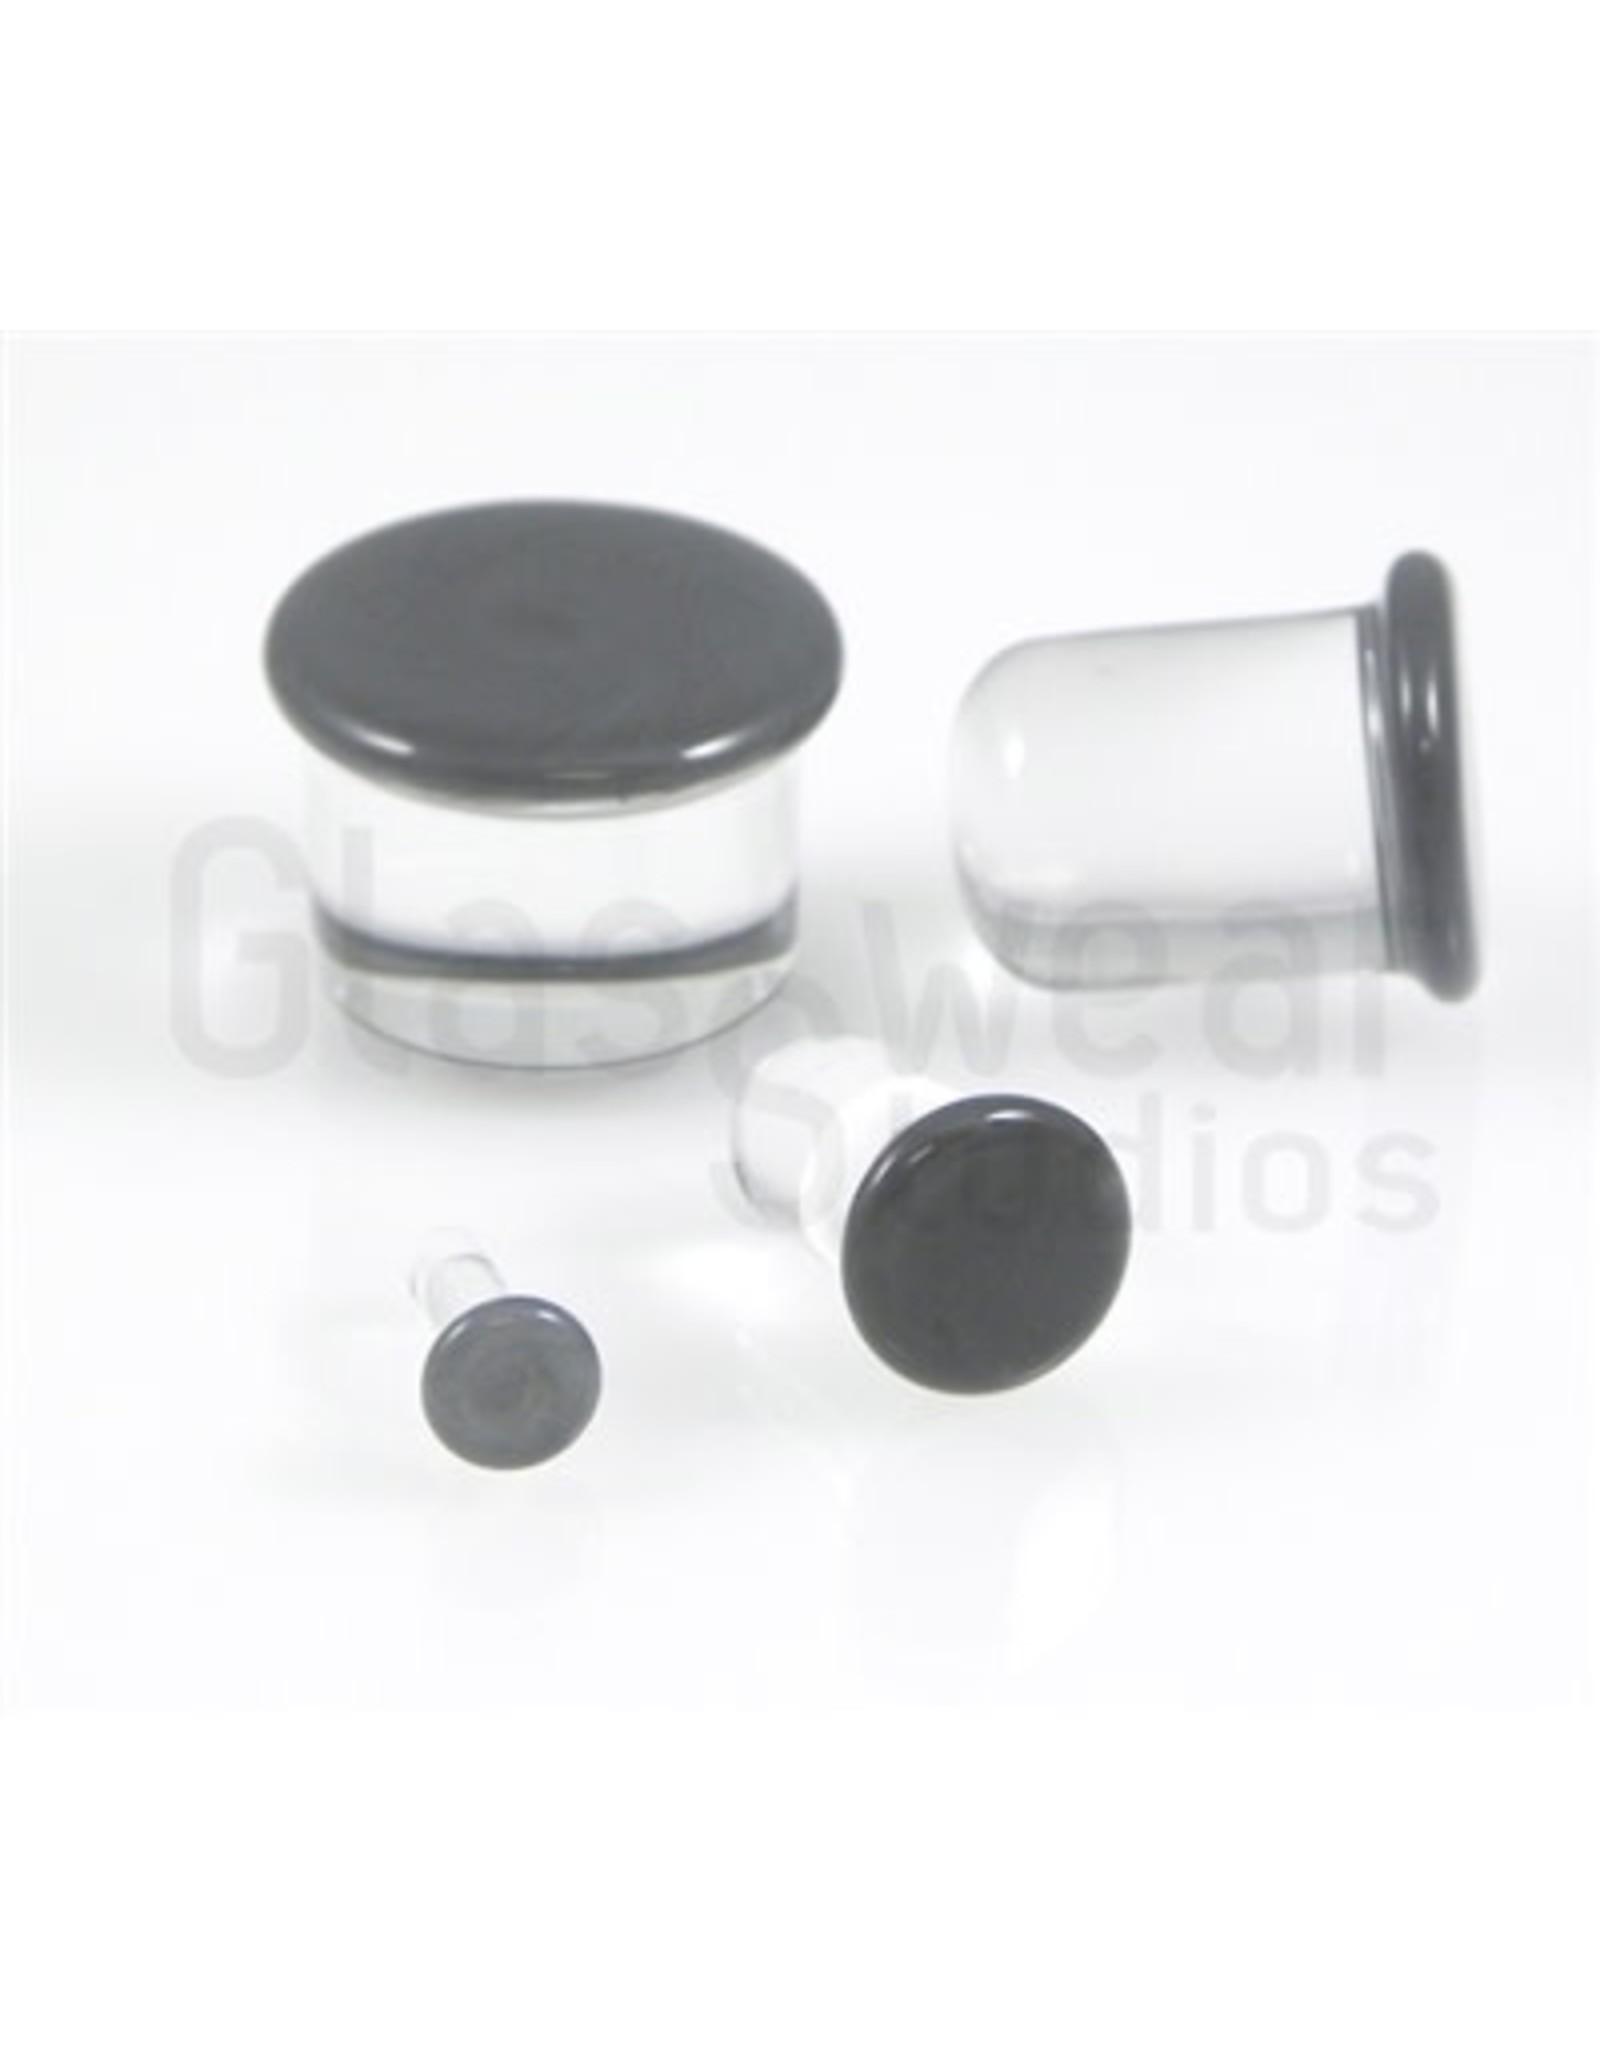 000g-10mm SF Glass Plugs